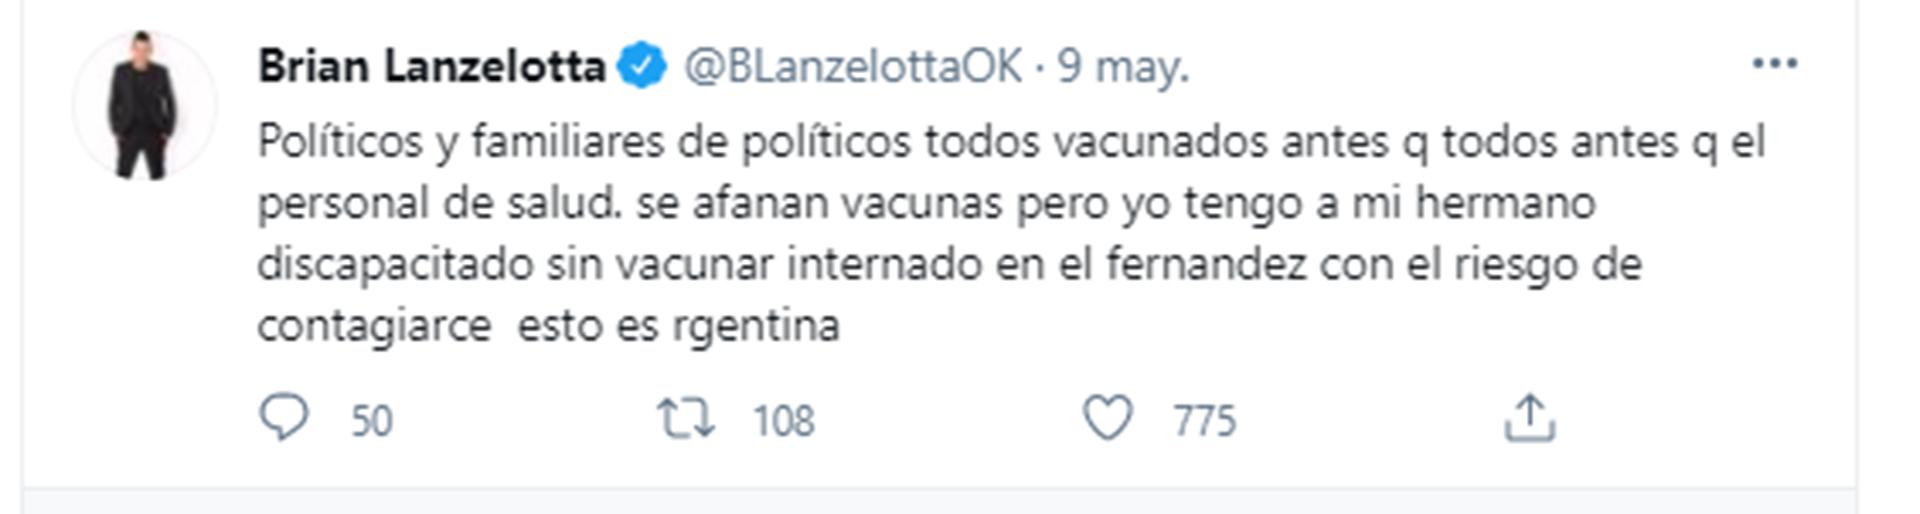 El enojo de Brian Lanzelotta en Twitter